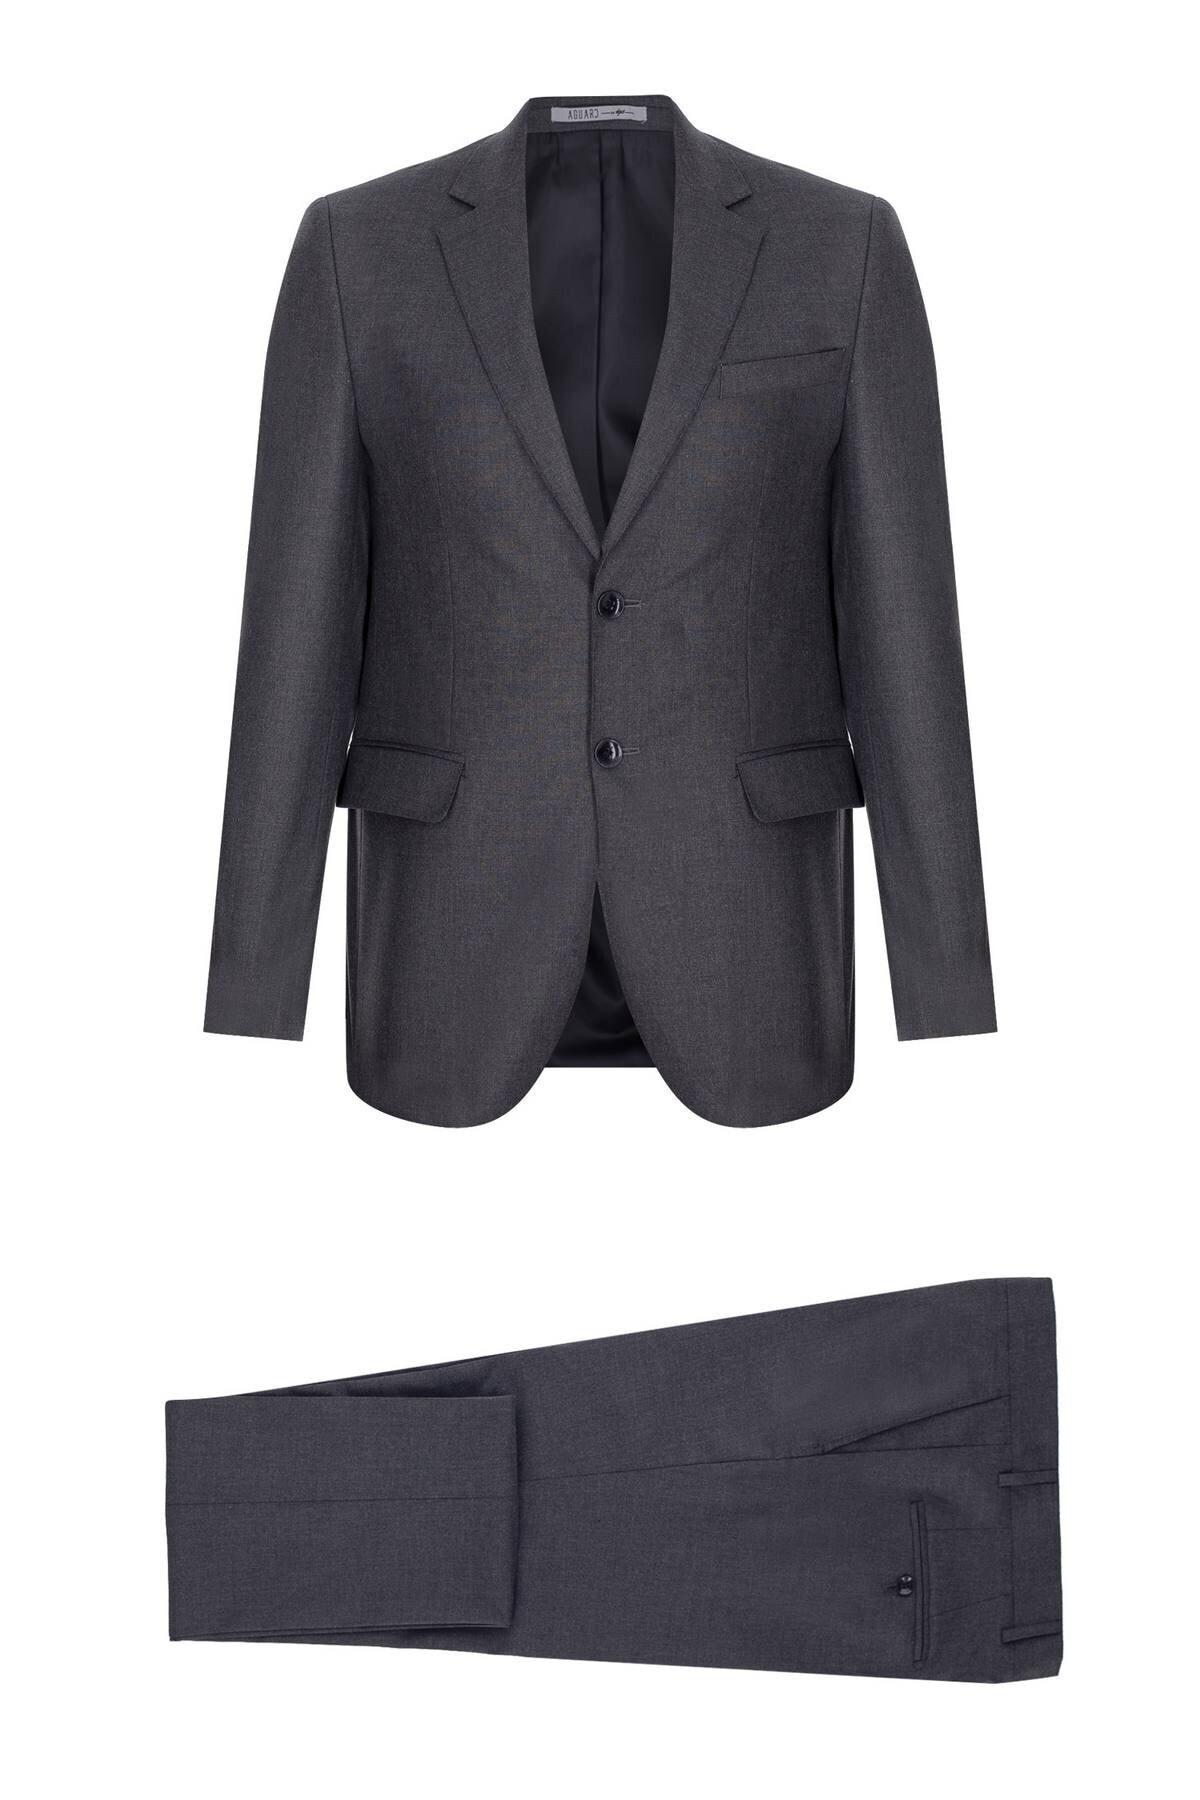 İgs Erkek Füme Regularfıt / Rahat Kalıp Std Takım Elbise 1